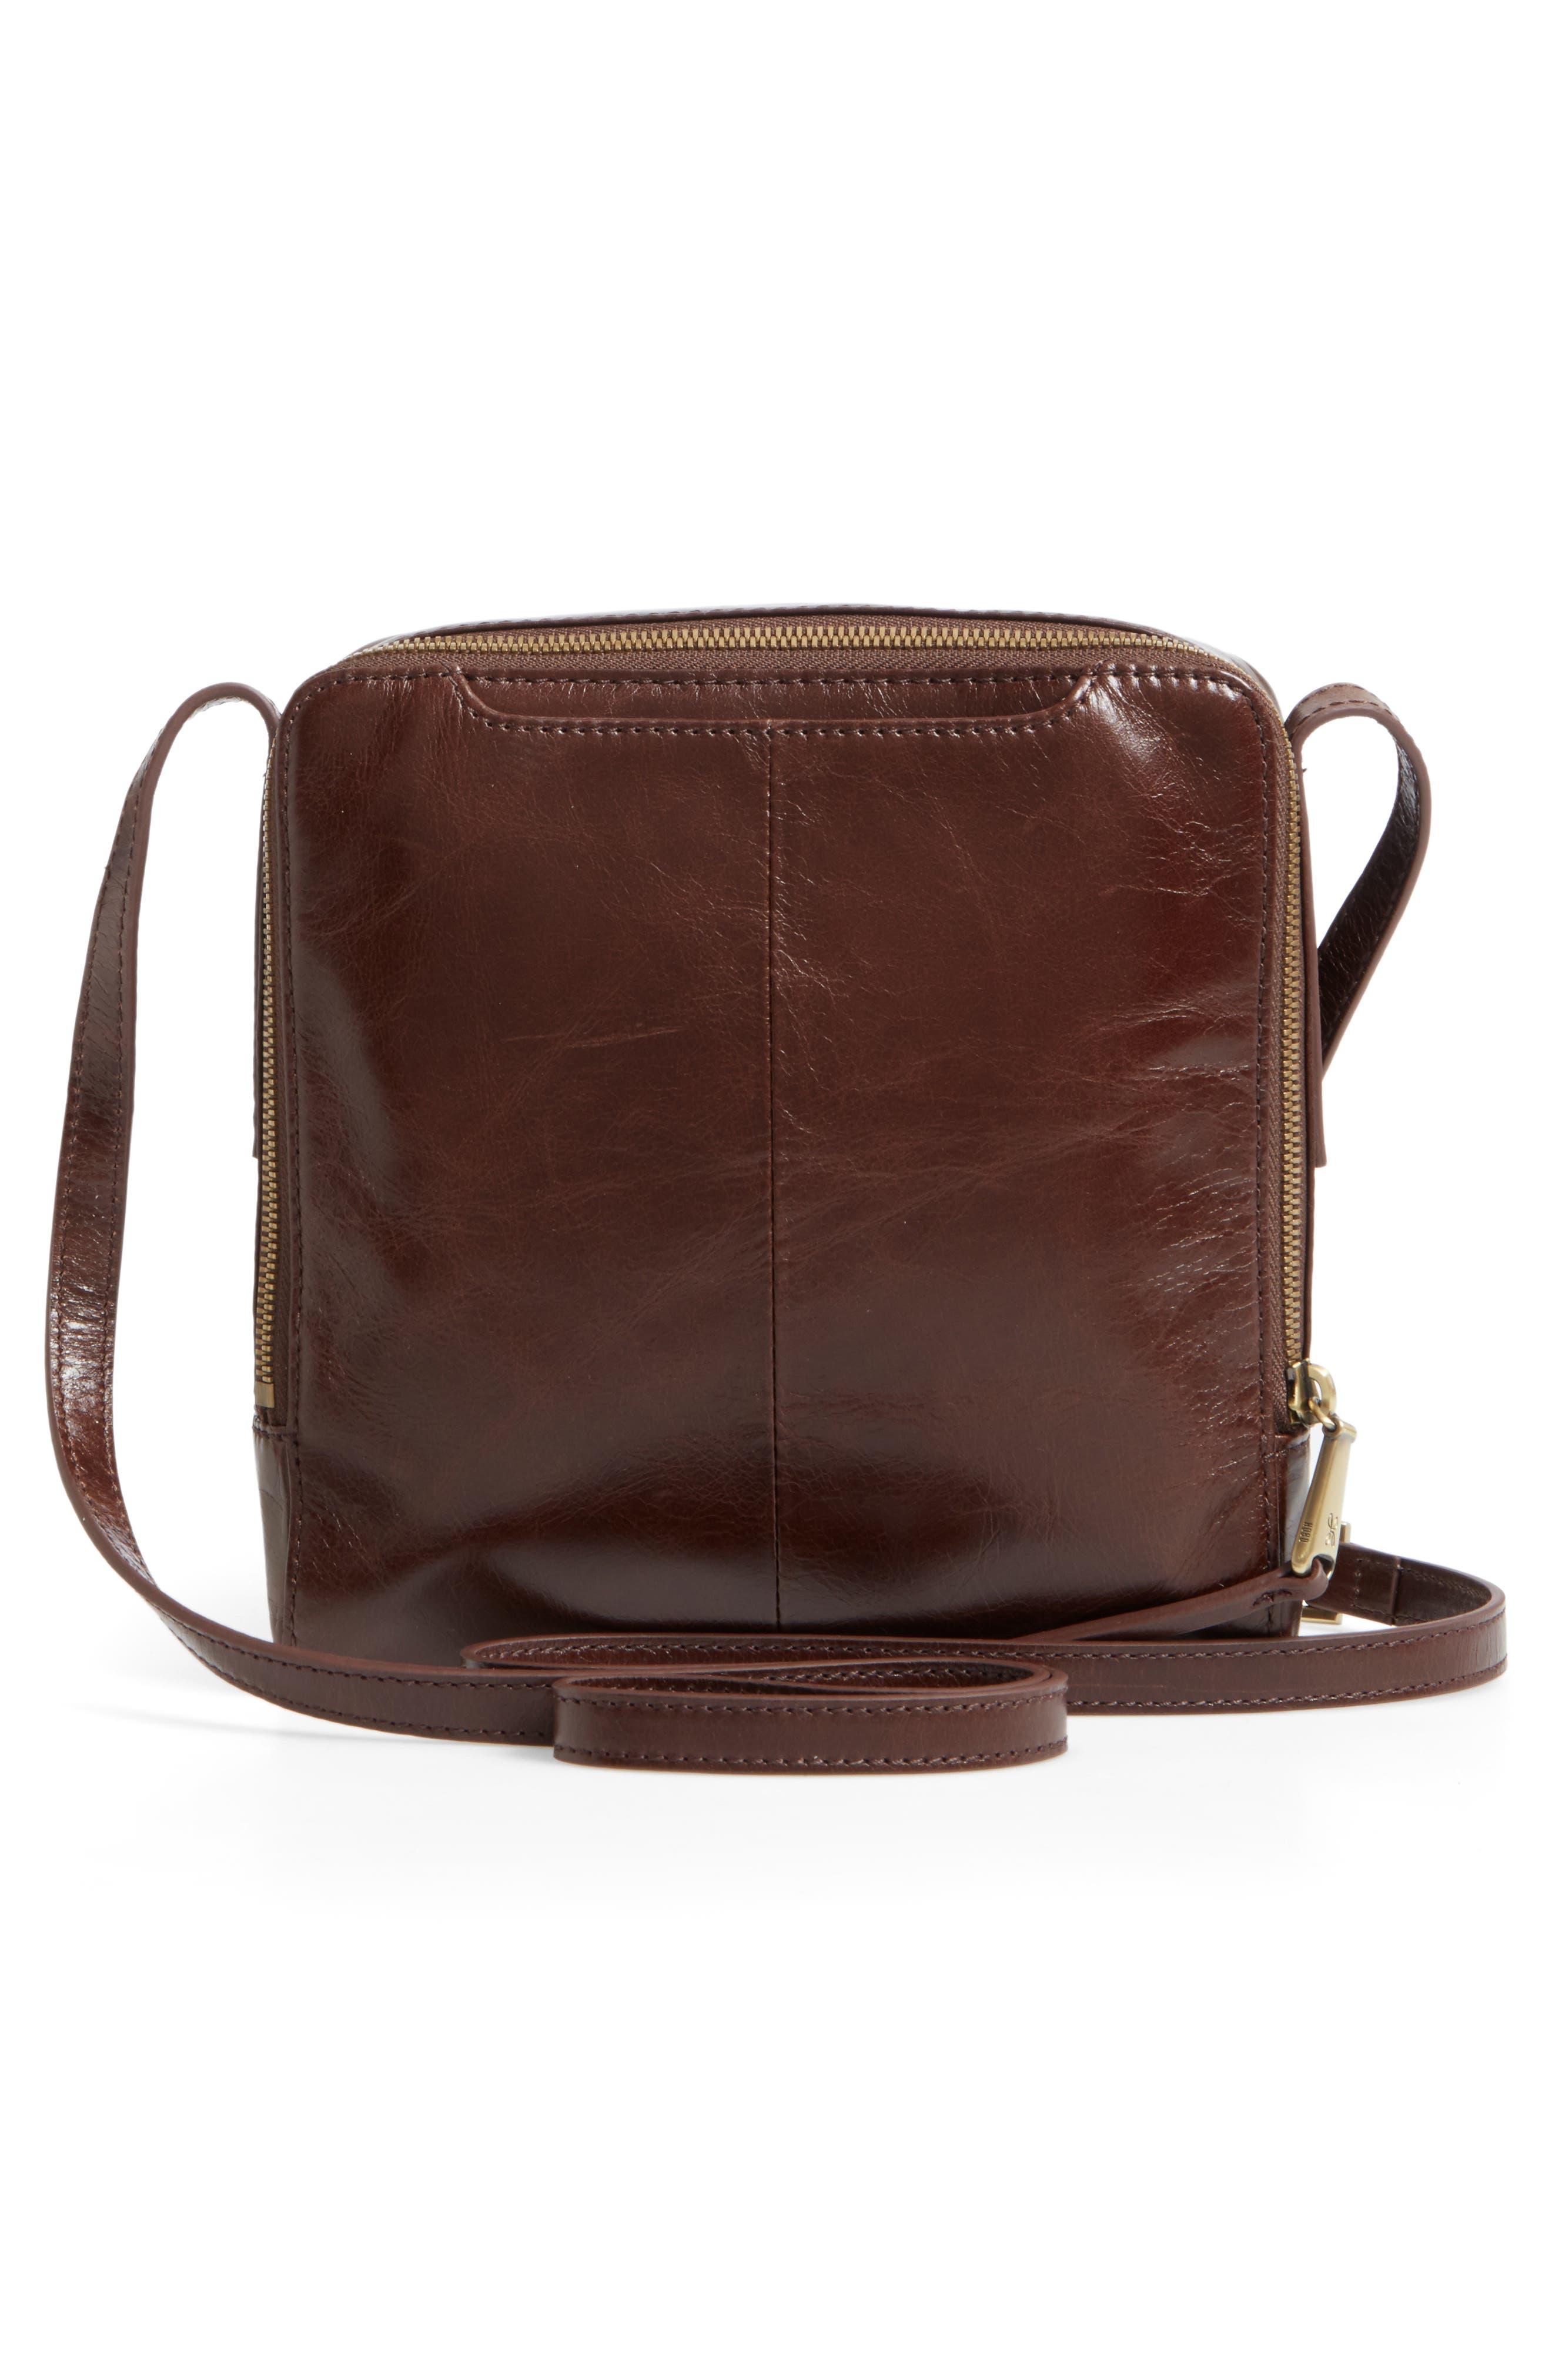 Lyric Leather Crossbody Bag,                             Alternate thumbnail 3, color,                             Espresso